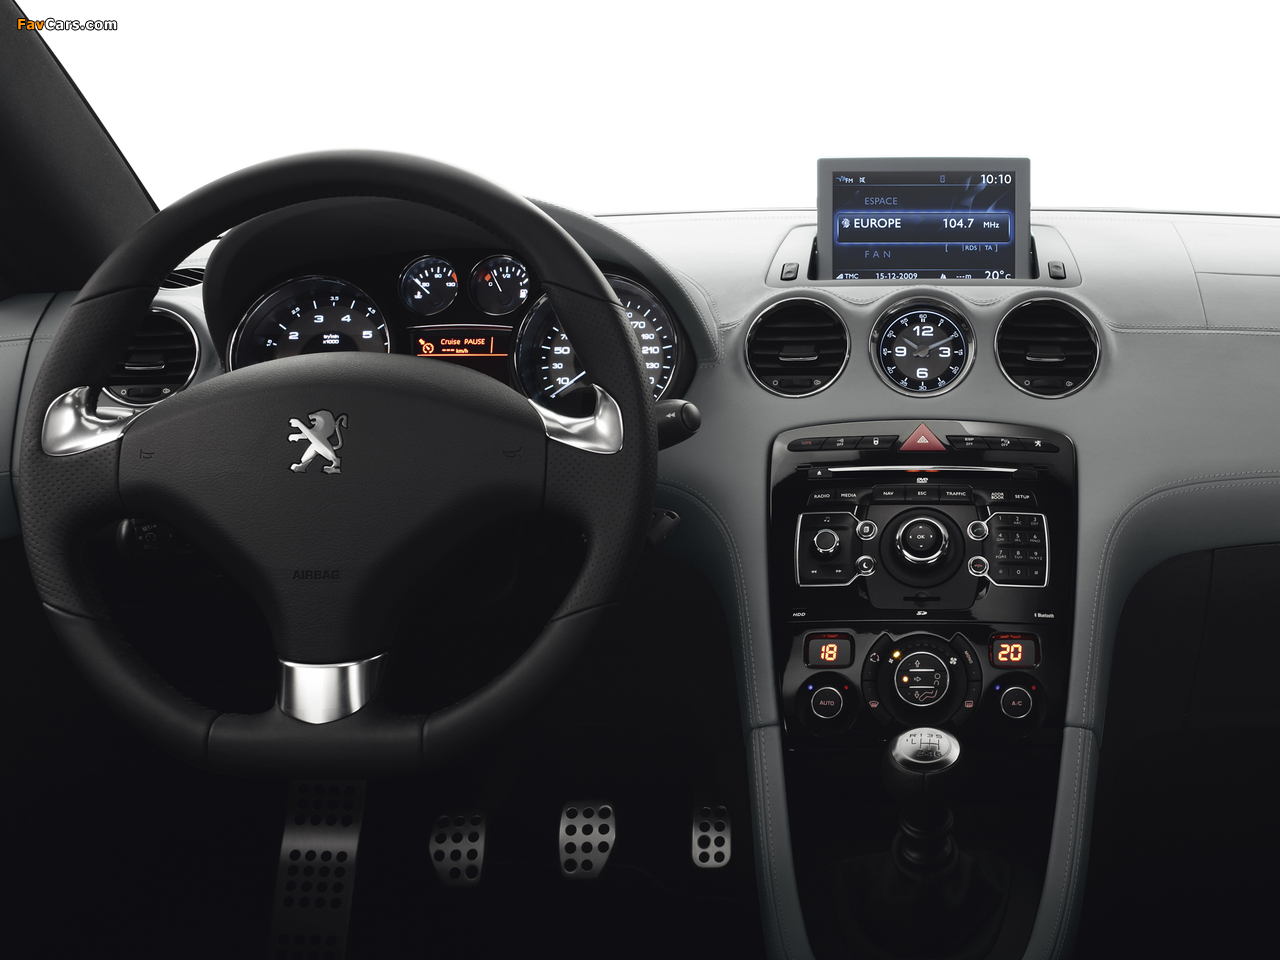 Peugeot RCZ 2010 images (1280 x 960)